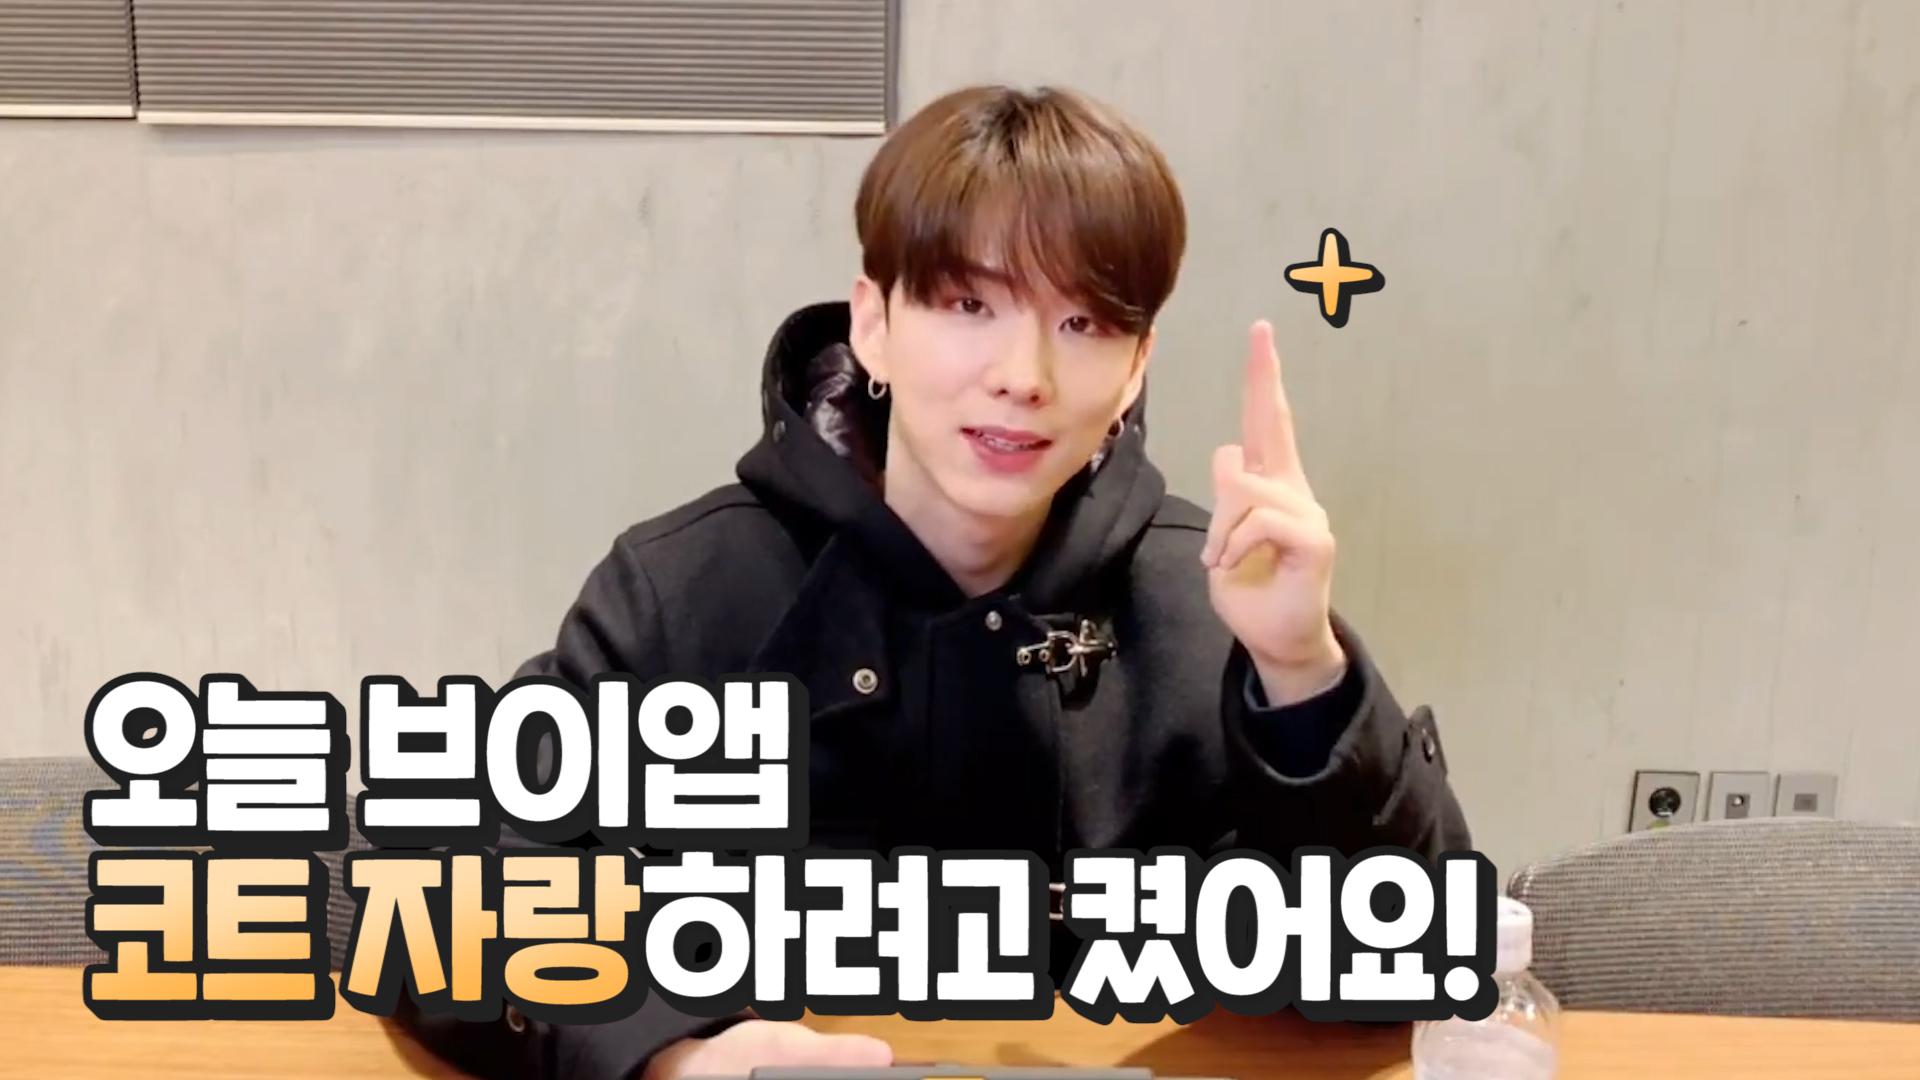 [MONSTA X] 오늘의 브이픽 목적 : 와기여우 얼굴 자랑🦊✨ (KIHYUN showing off his new coat)